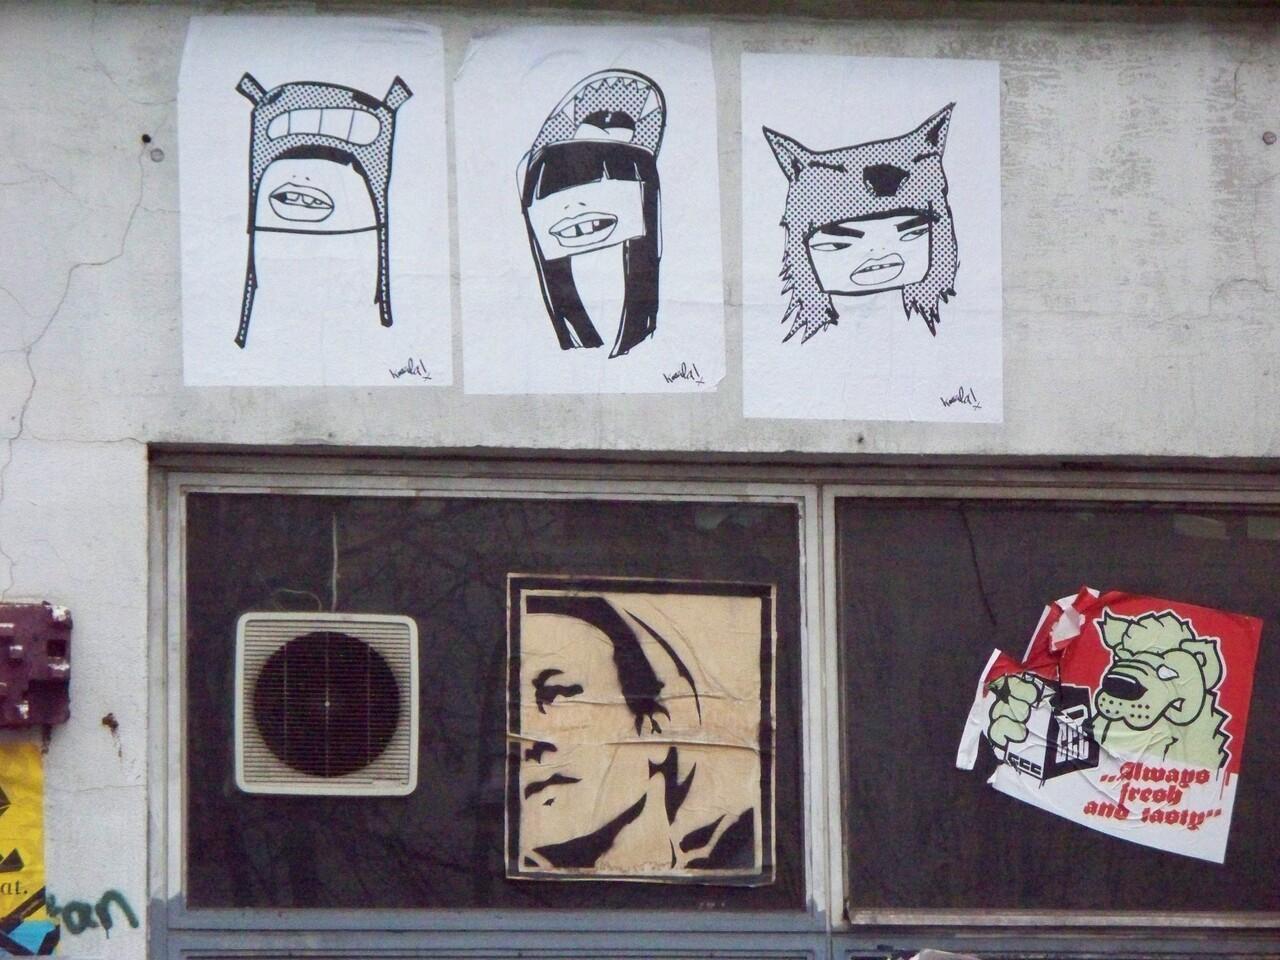 street art neues kreuzberger zentrum sten the man. Black Bedroom Furniture Sets. Home Design Ideas